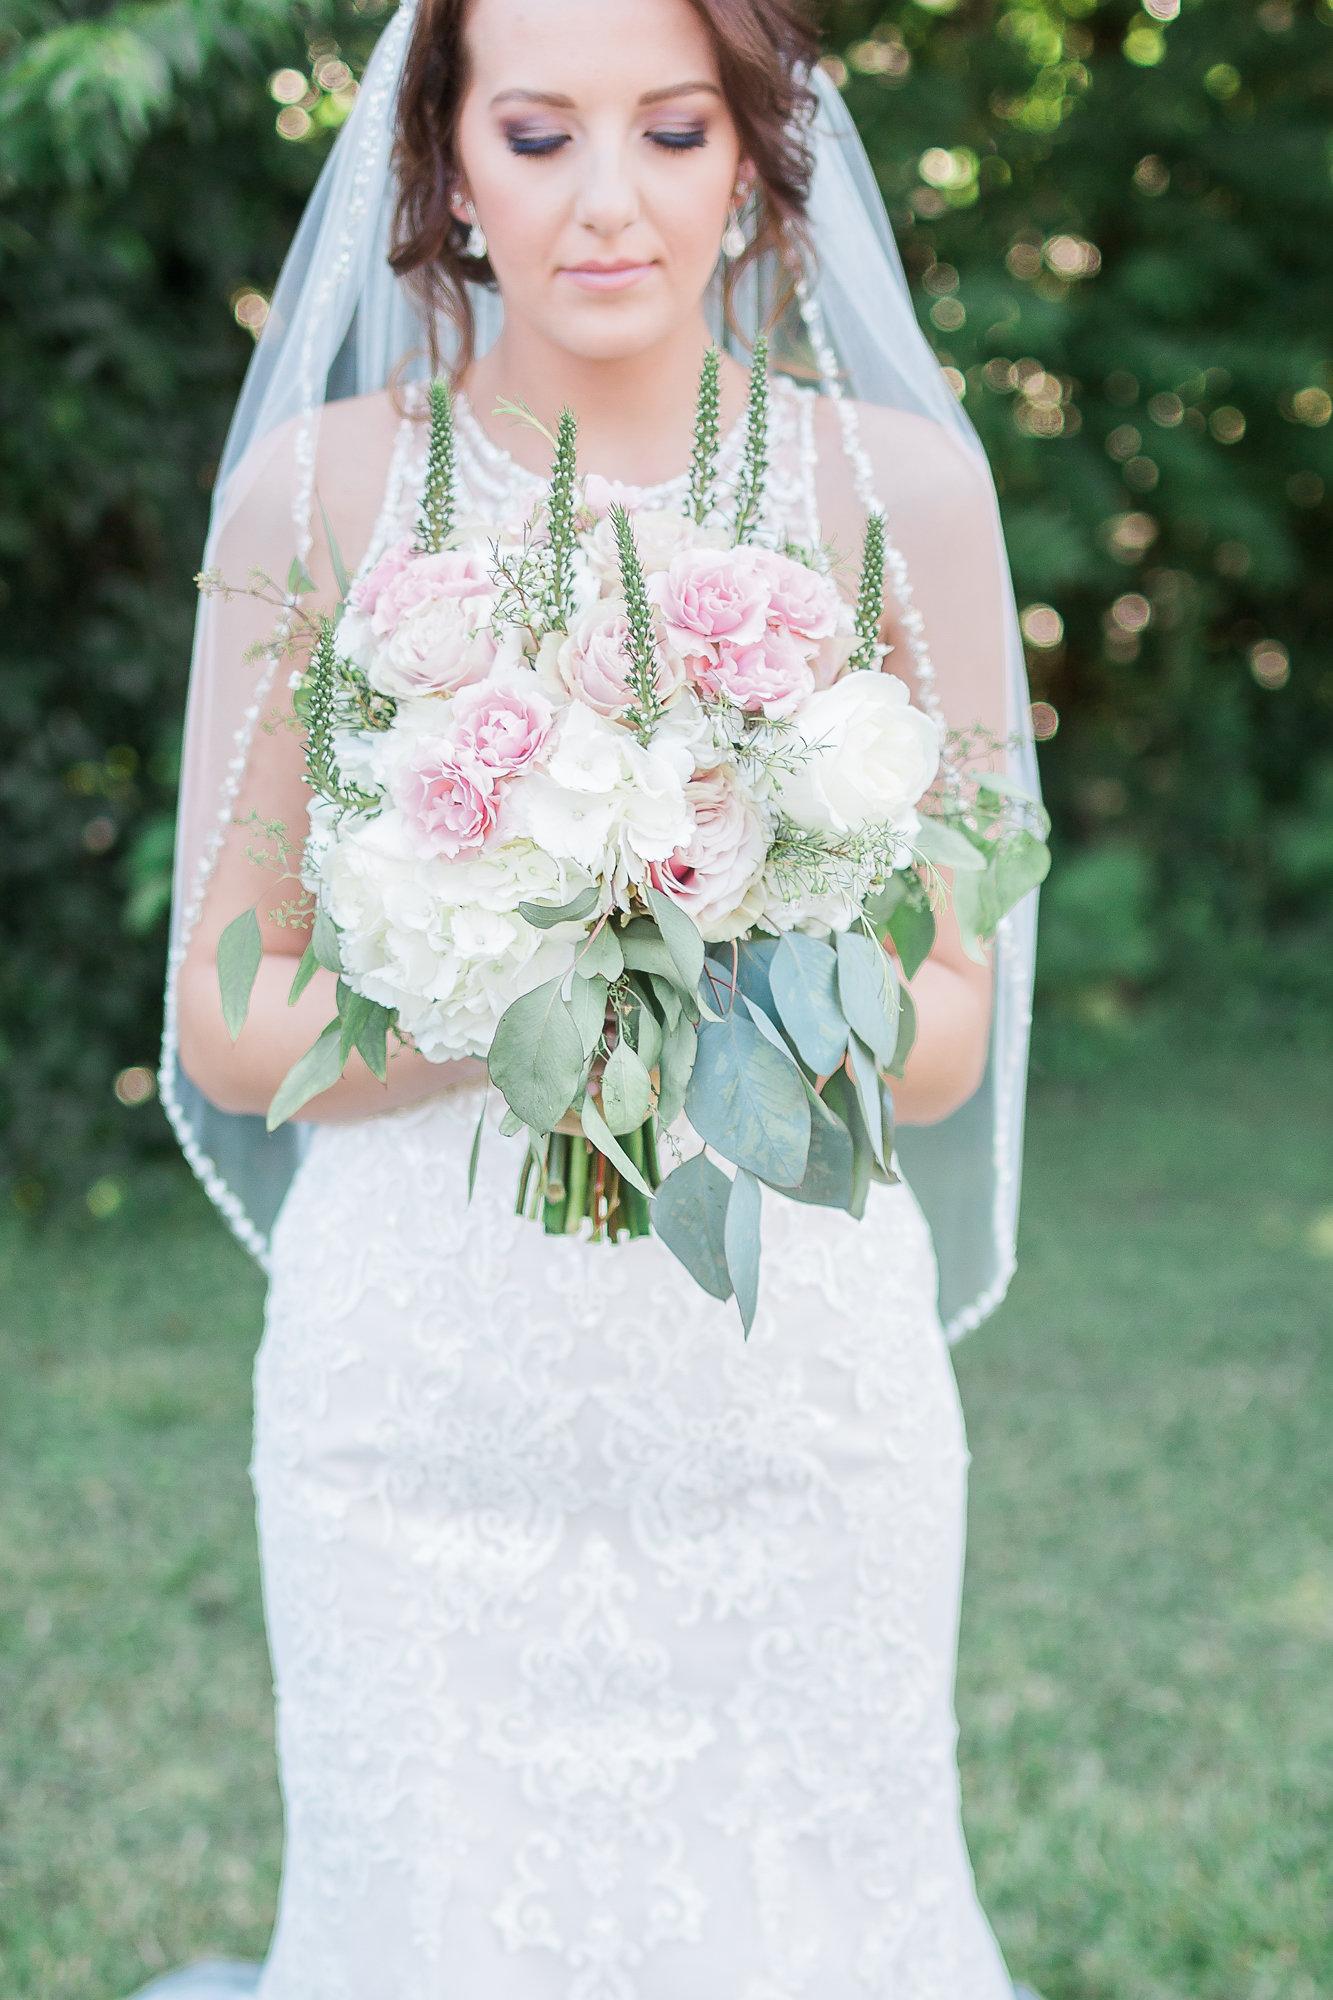 A White + Blush East Tennessee Modern Church Wedding - Robin Collins Photography -- Wedding Blog - The Overwhelmed Bride